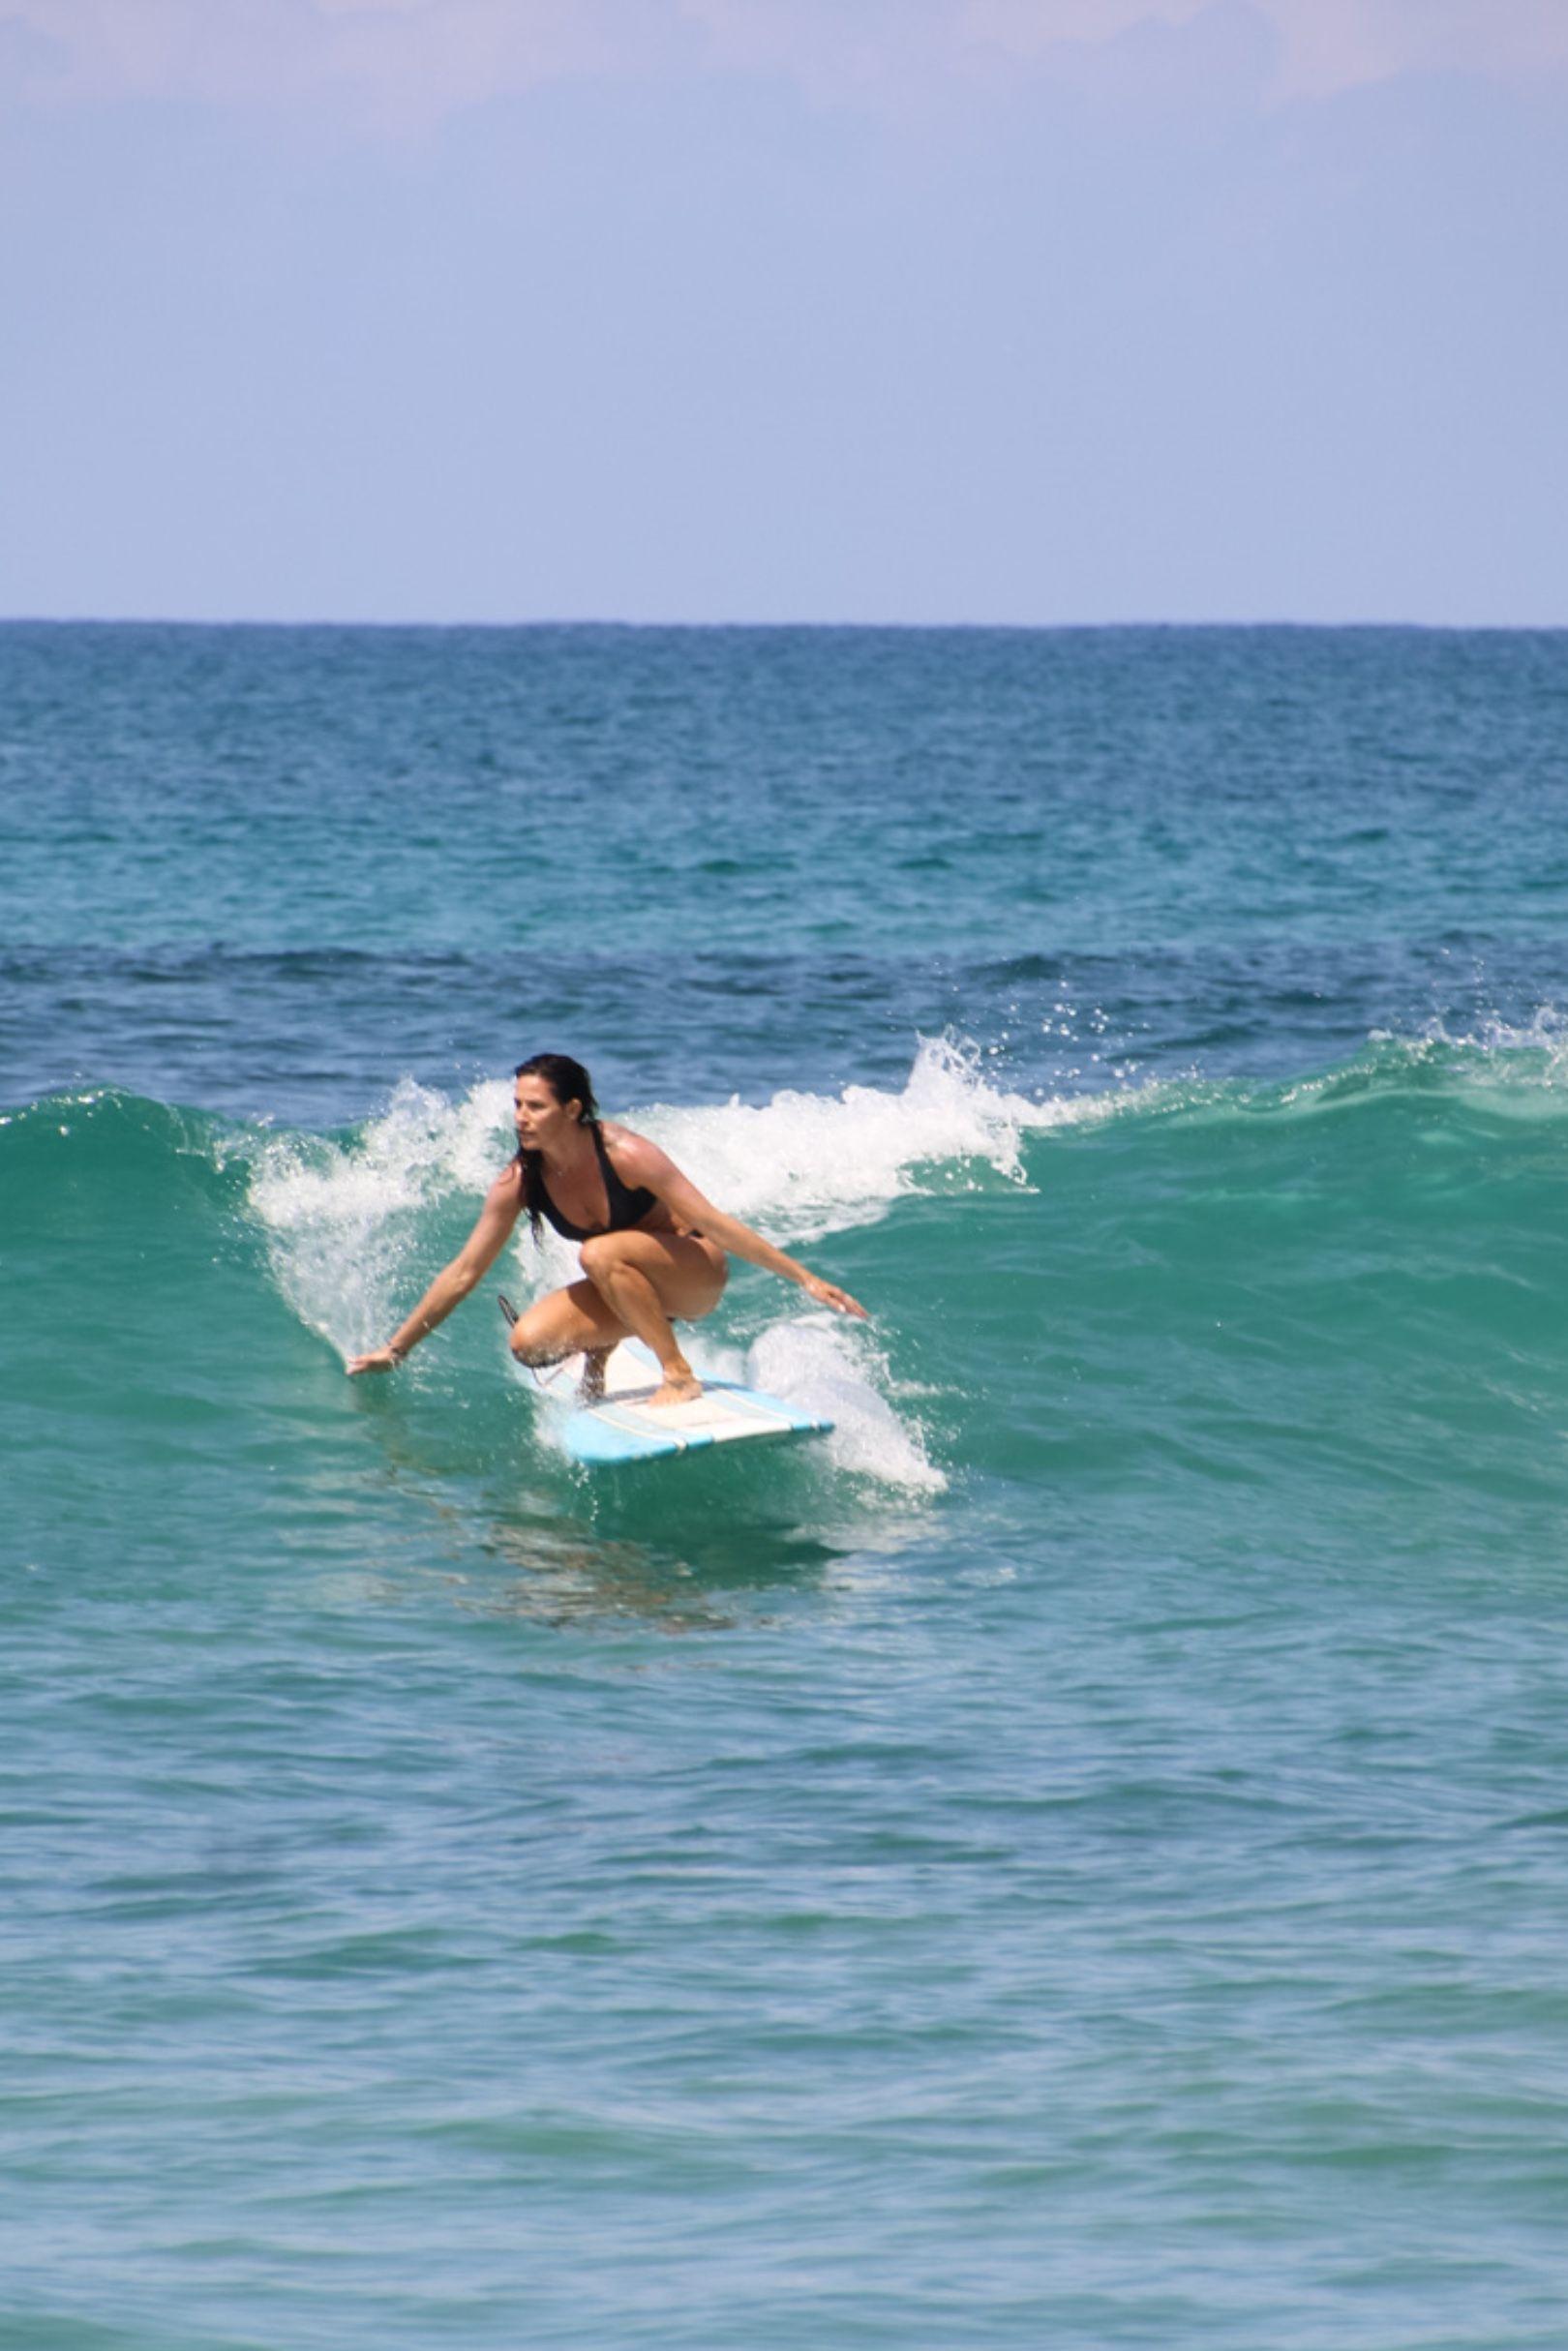 Surf Ii Surf Camp Mexico Resorts Surf Camp Spa Vacation